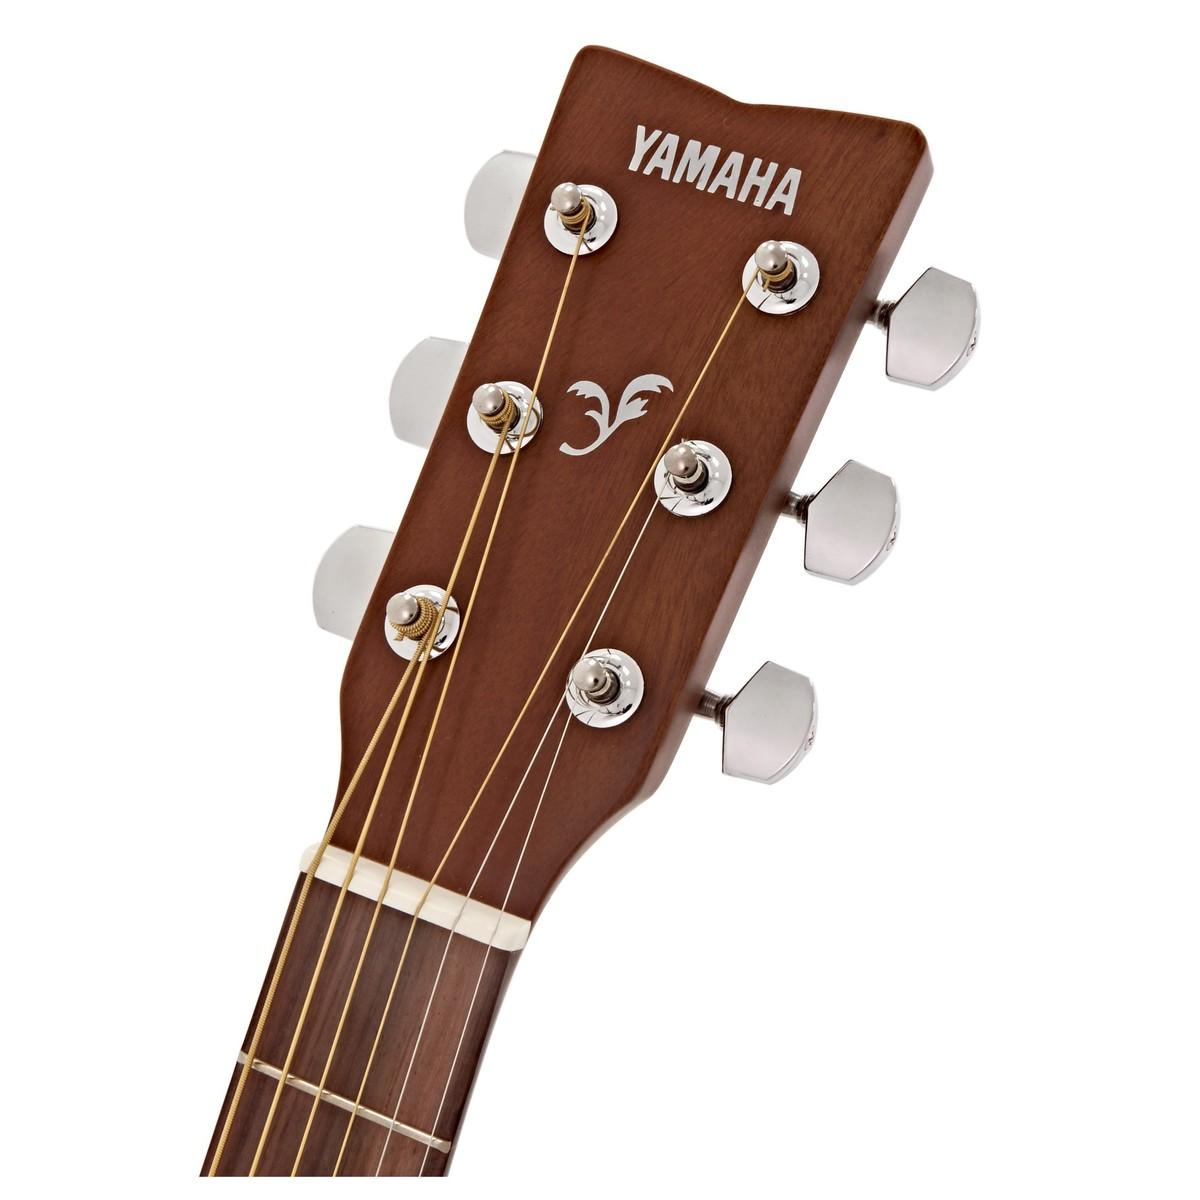 Yamaha f310 acoustic guitar natural at for Yamaha guitar brands